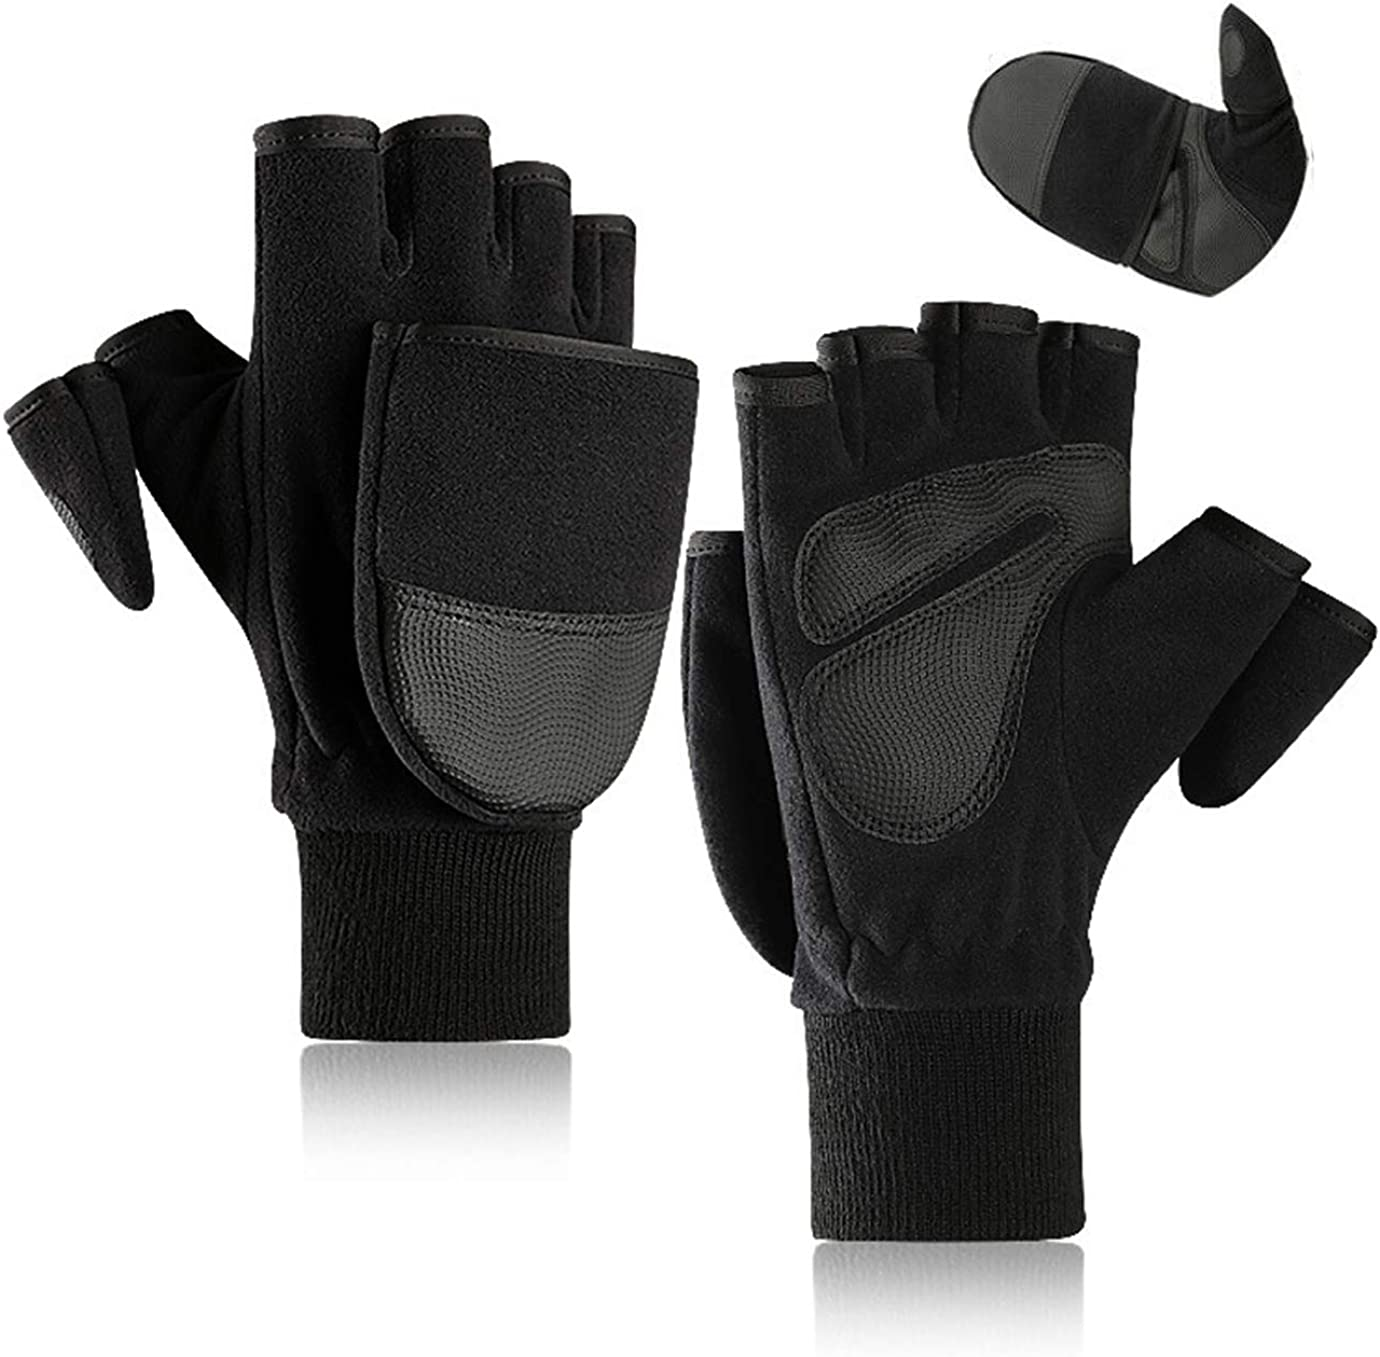 Sherpa Fleece Convertible Mitt//Shooters Glove Gloves Camping Hiking Outdoors